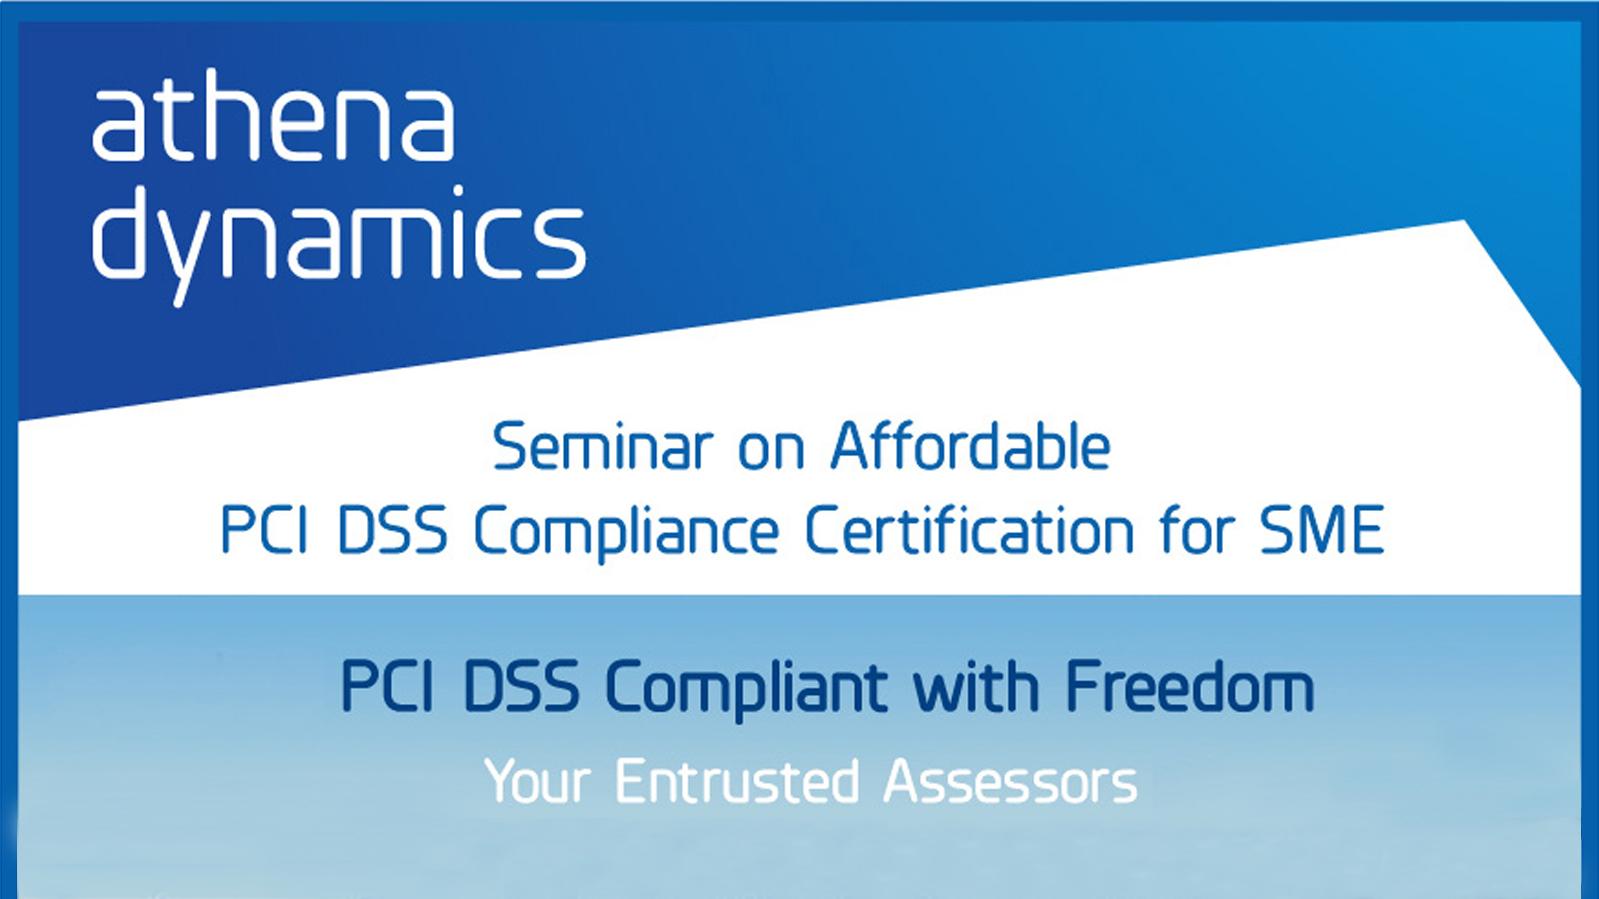 PCI DSS Seminar